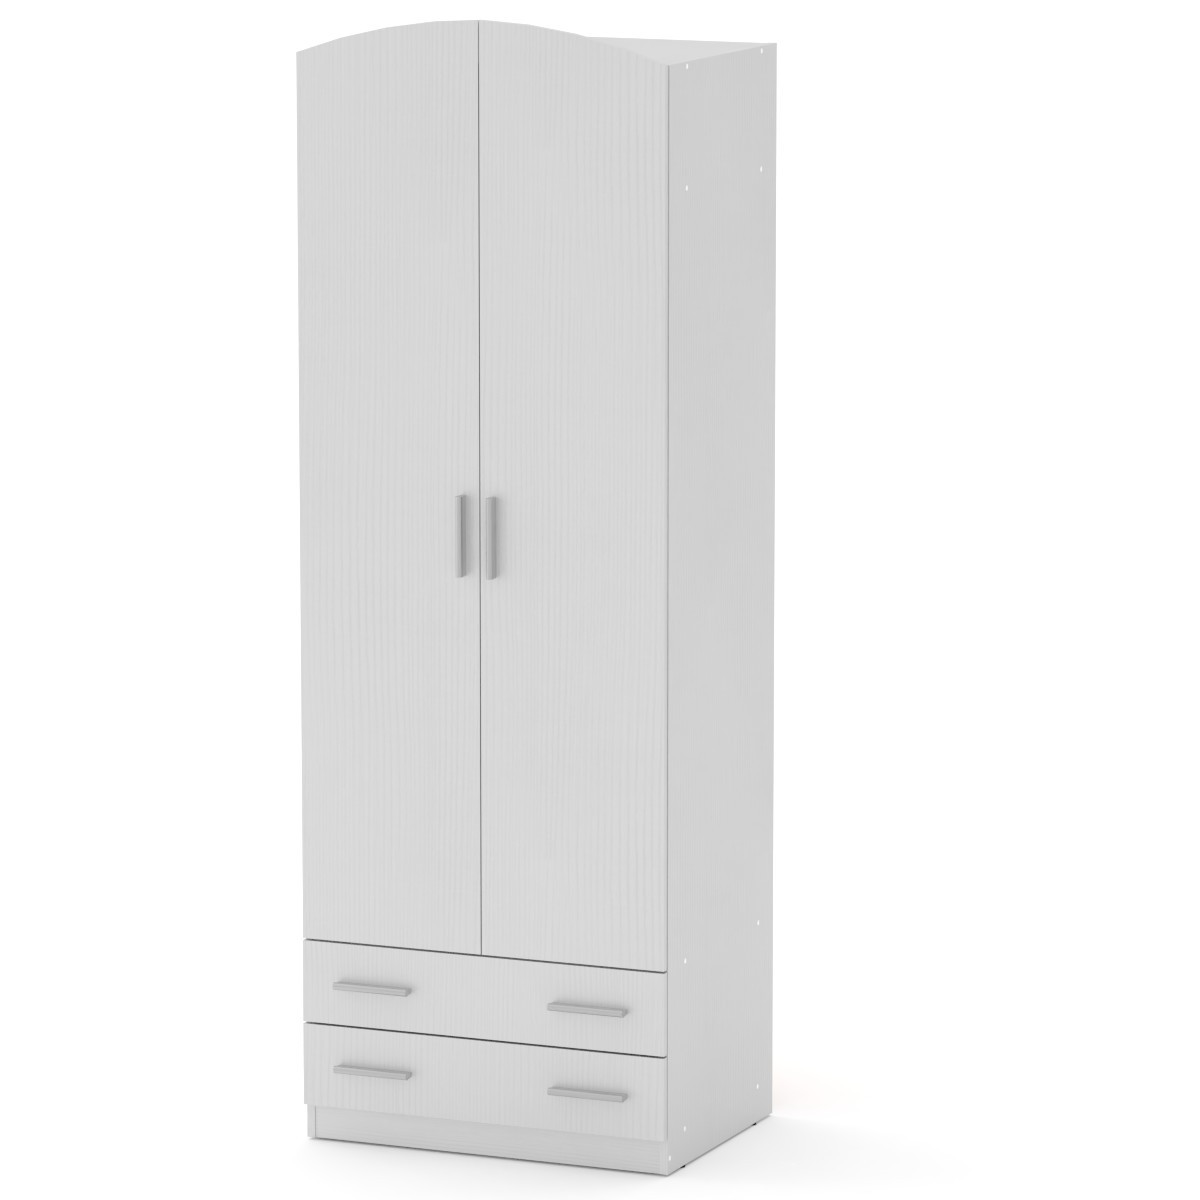 Шкаф-4 нимфея альба (белый) Компанит (74х54х212 см)